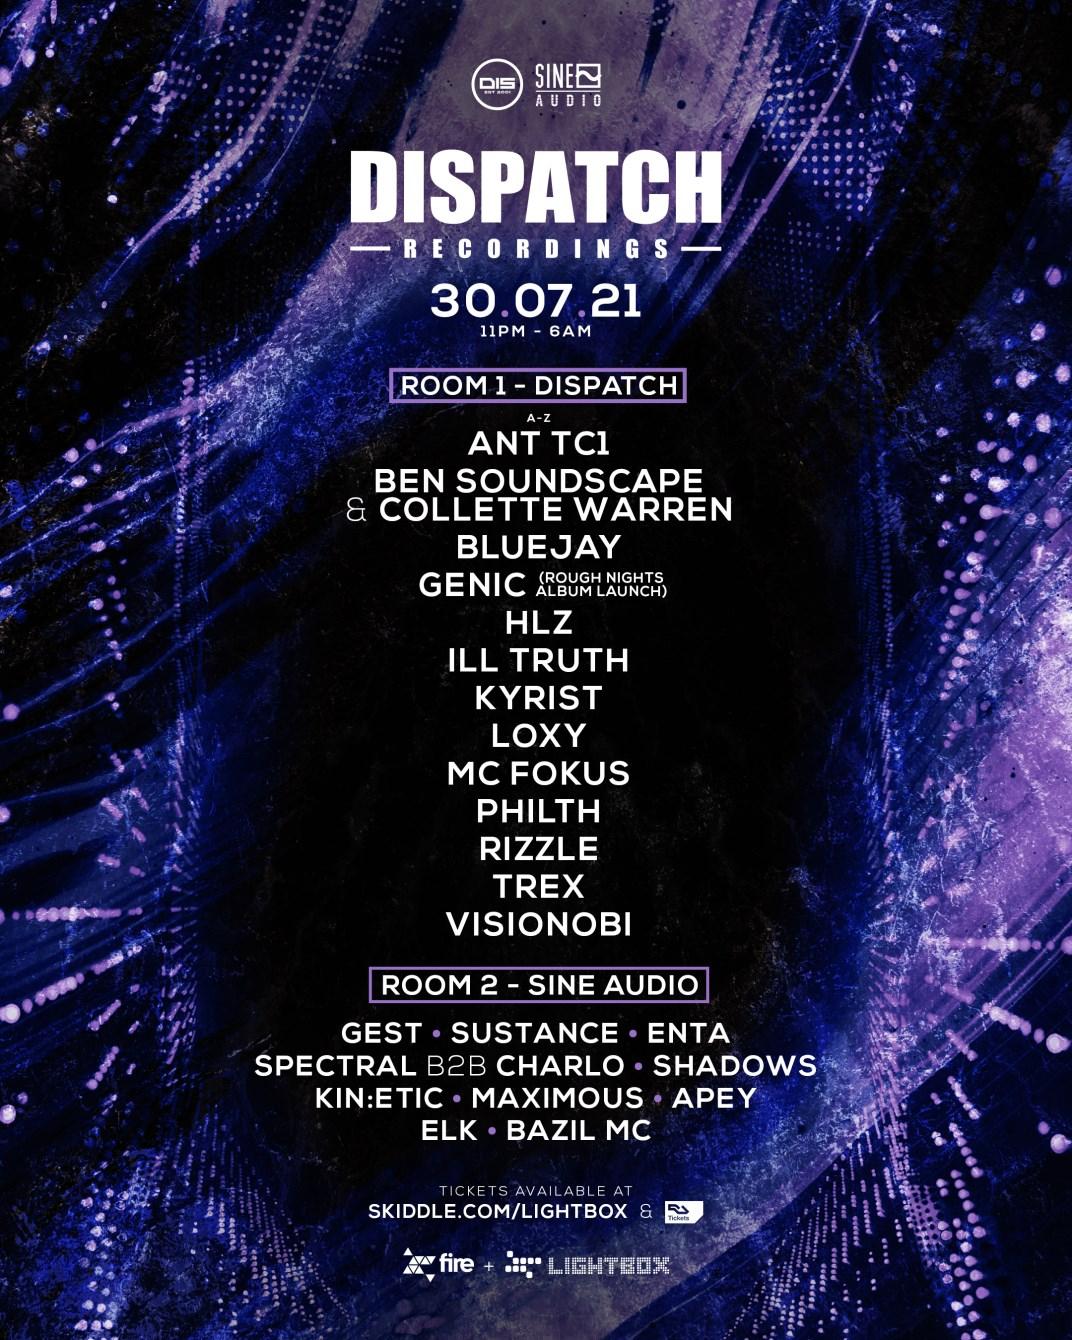 Dispatch Recordings London - Flyer front